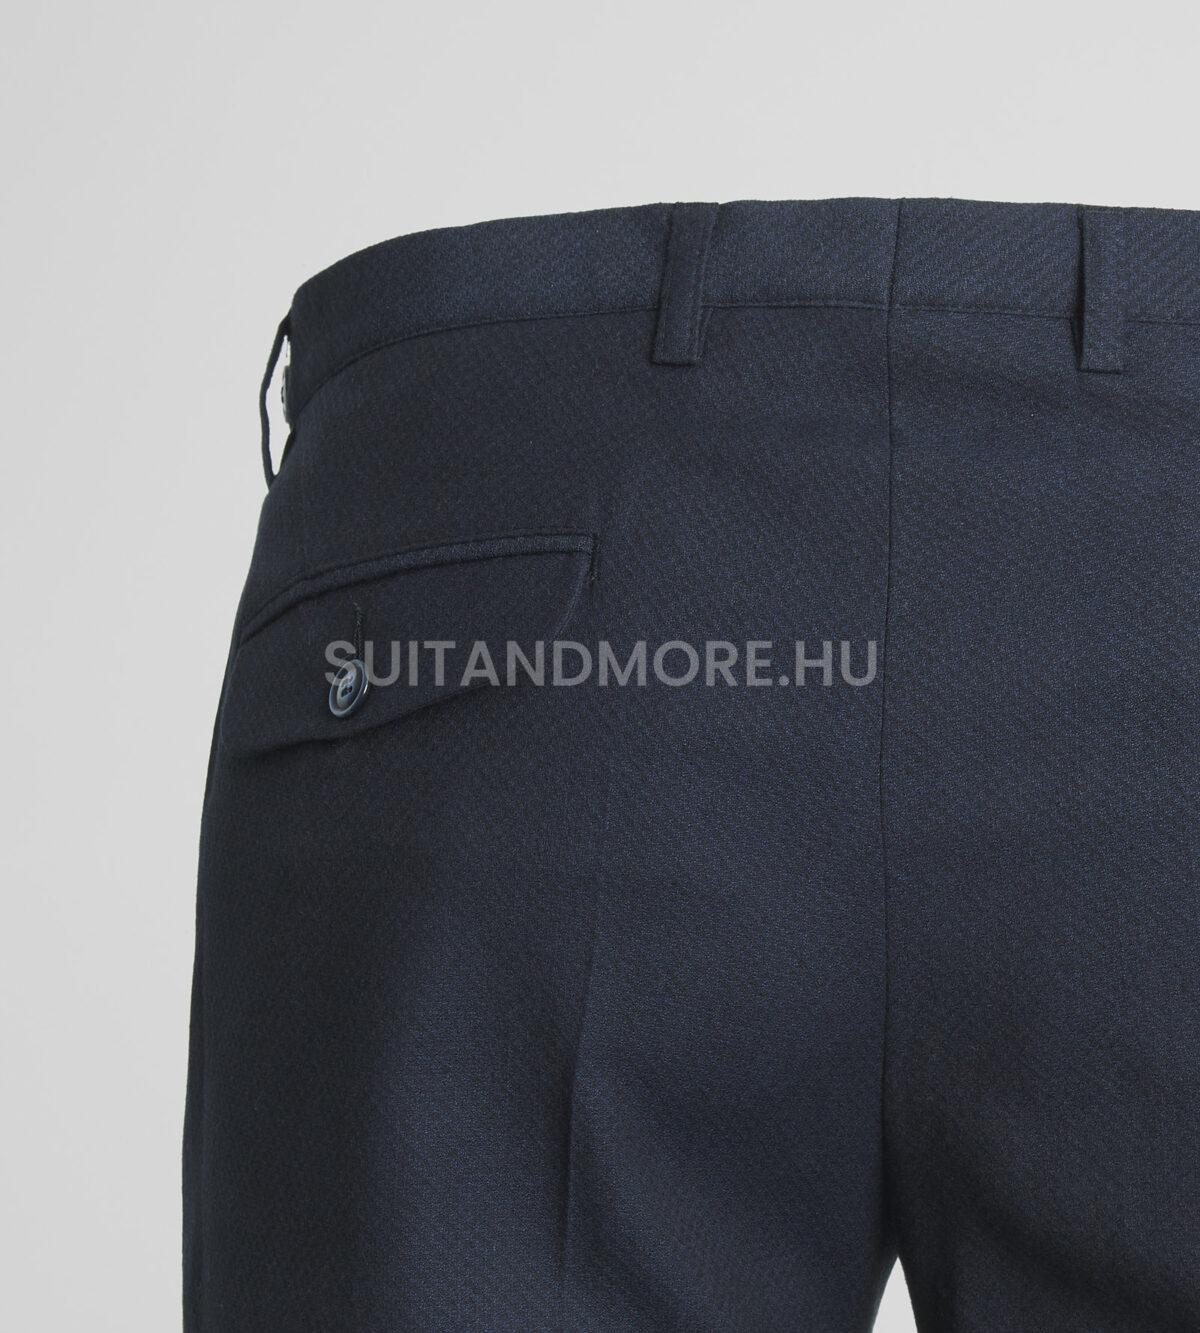 sötétkék-extra-slim-fit-gyapjú-kevert-szövetnadrág-NICO-1261188-20-03